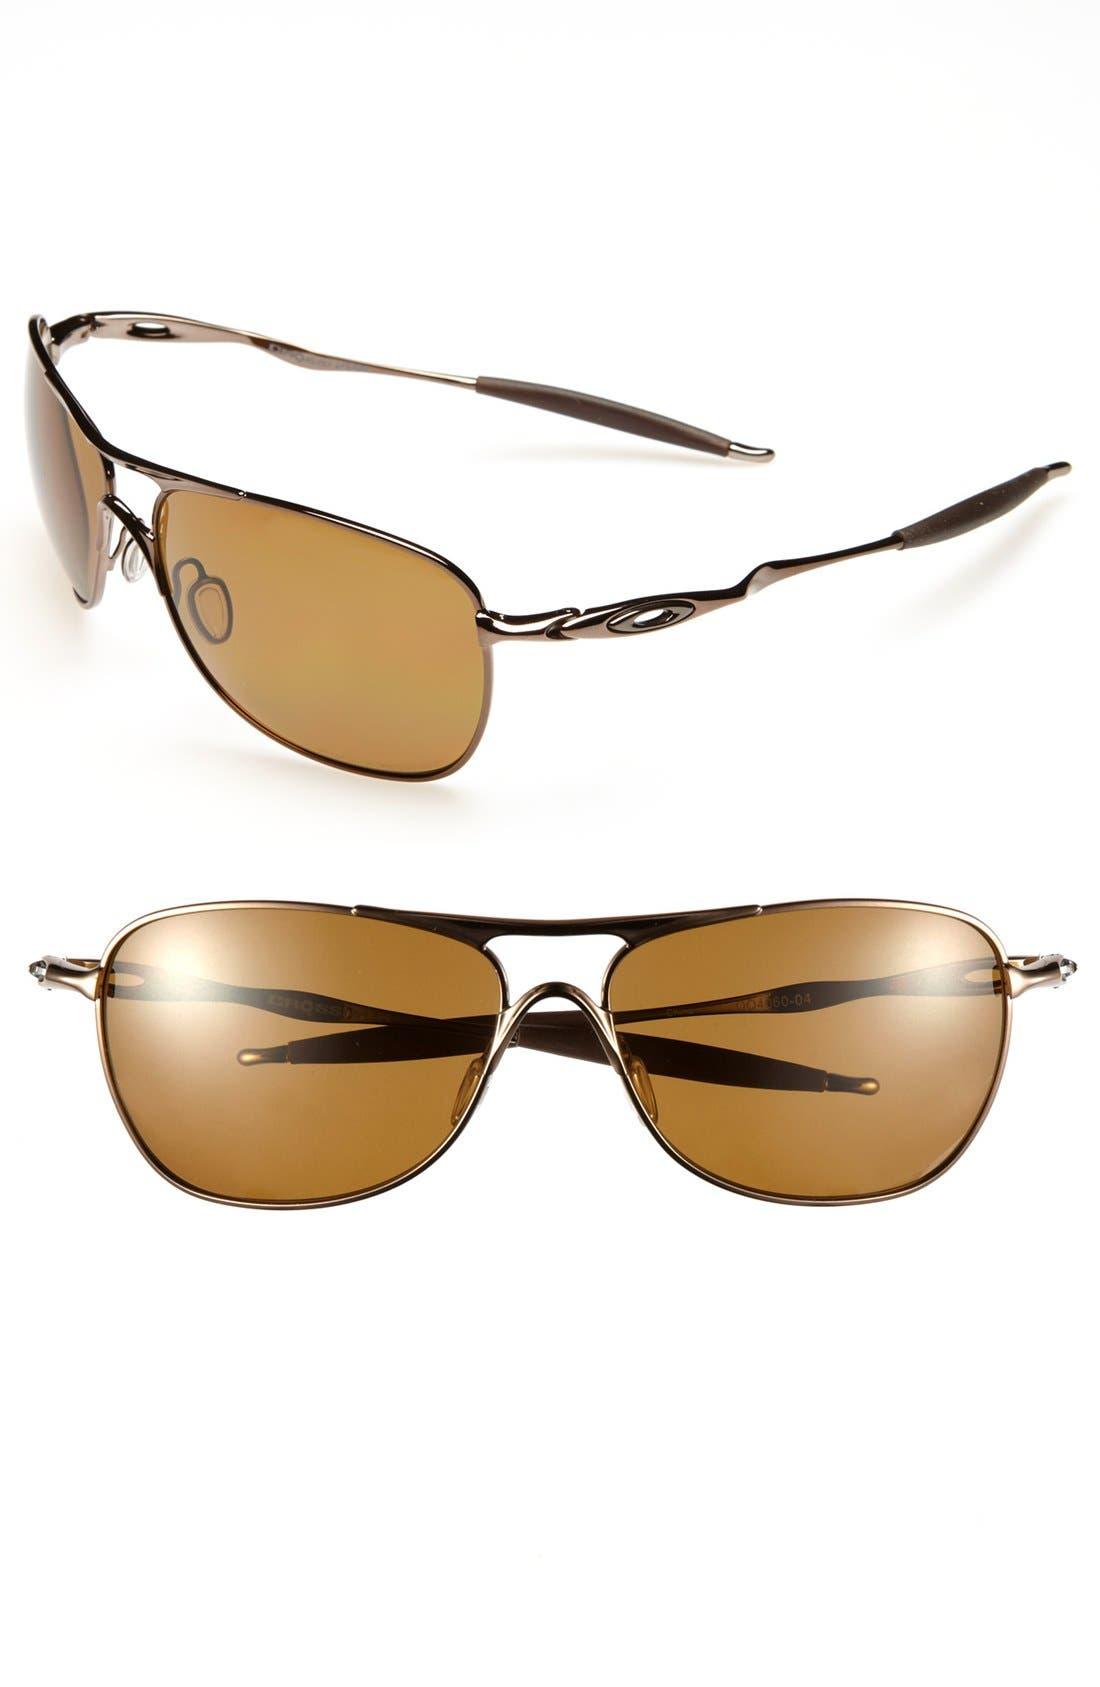 Alternate Image 1 Selected - Oakley 'Crosshair' 62mm Polarized Sunglasses